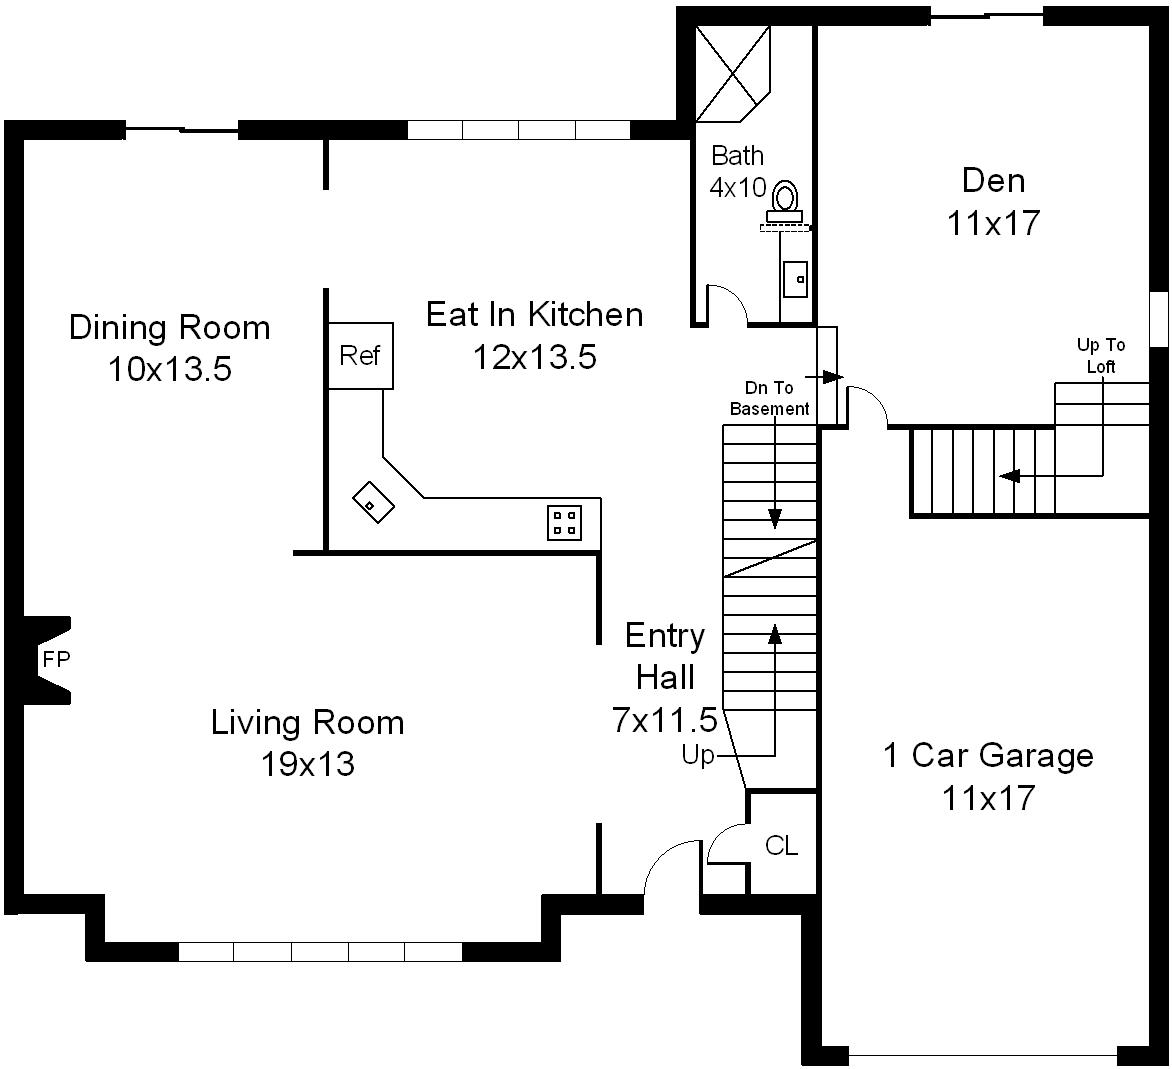 Floor Plans Of Huntington Village Colonial